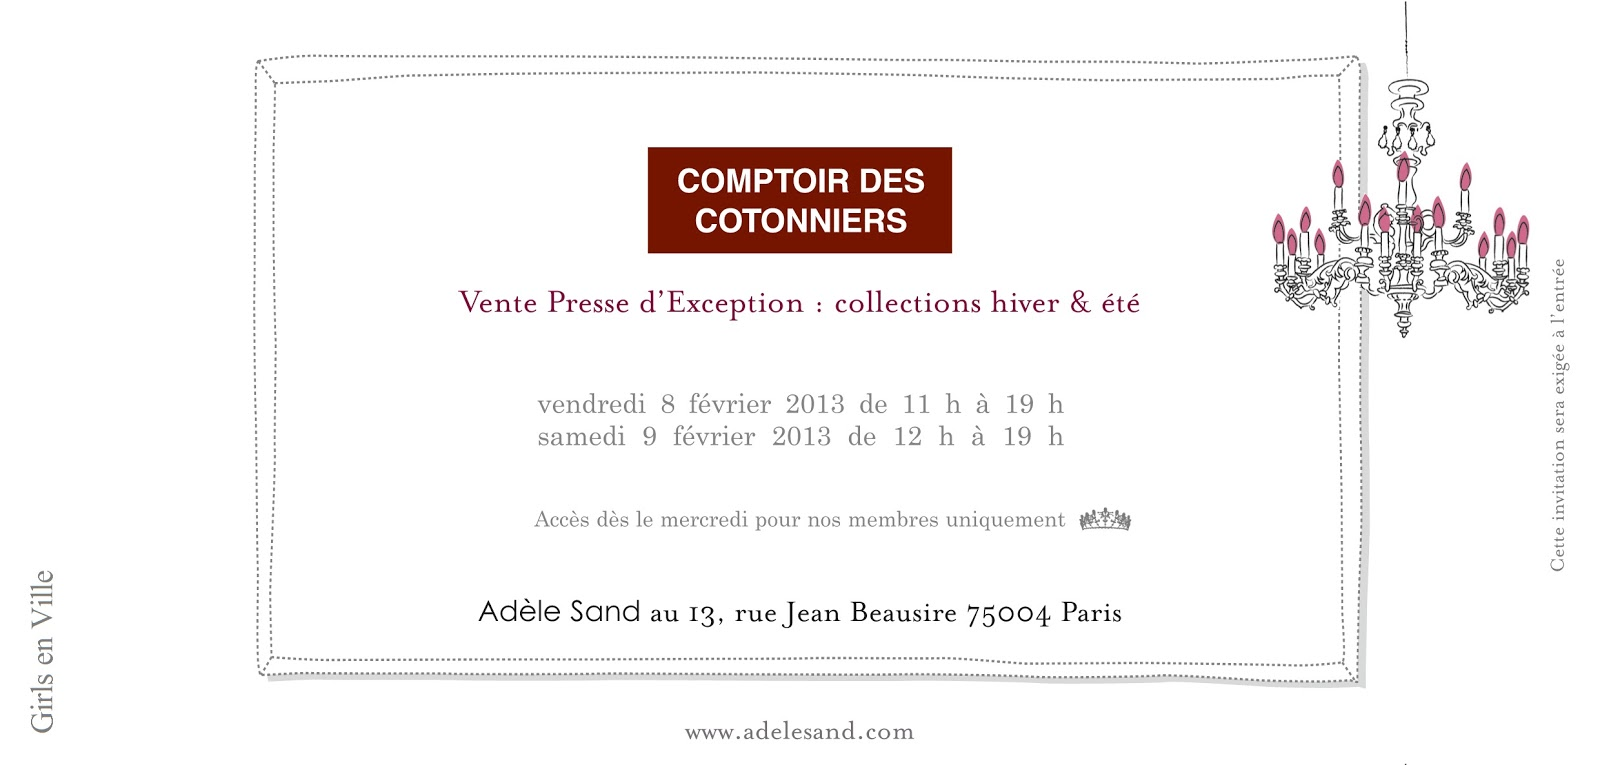 Comptoir des cotonniers big sales girls en ville - Ventes privees comptoir des cotonniers ...